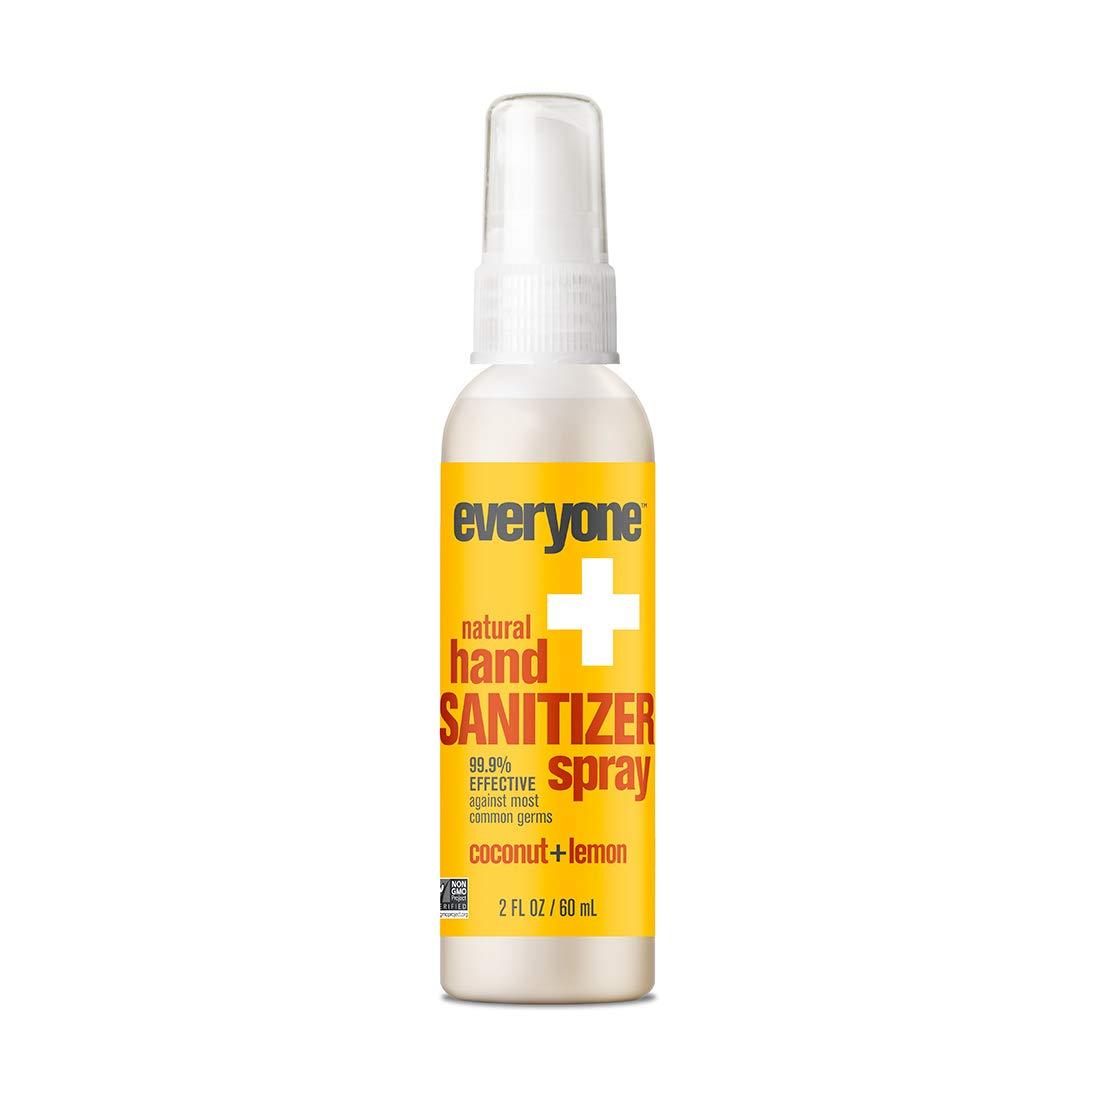 Everyone - Everyone Hand Sanitizer Spray, Coconut and Lemon, 2oz, 6 Count